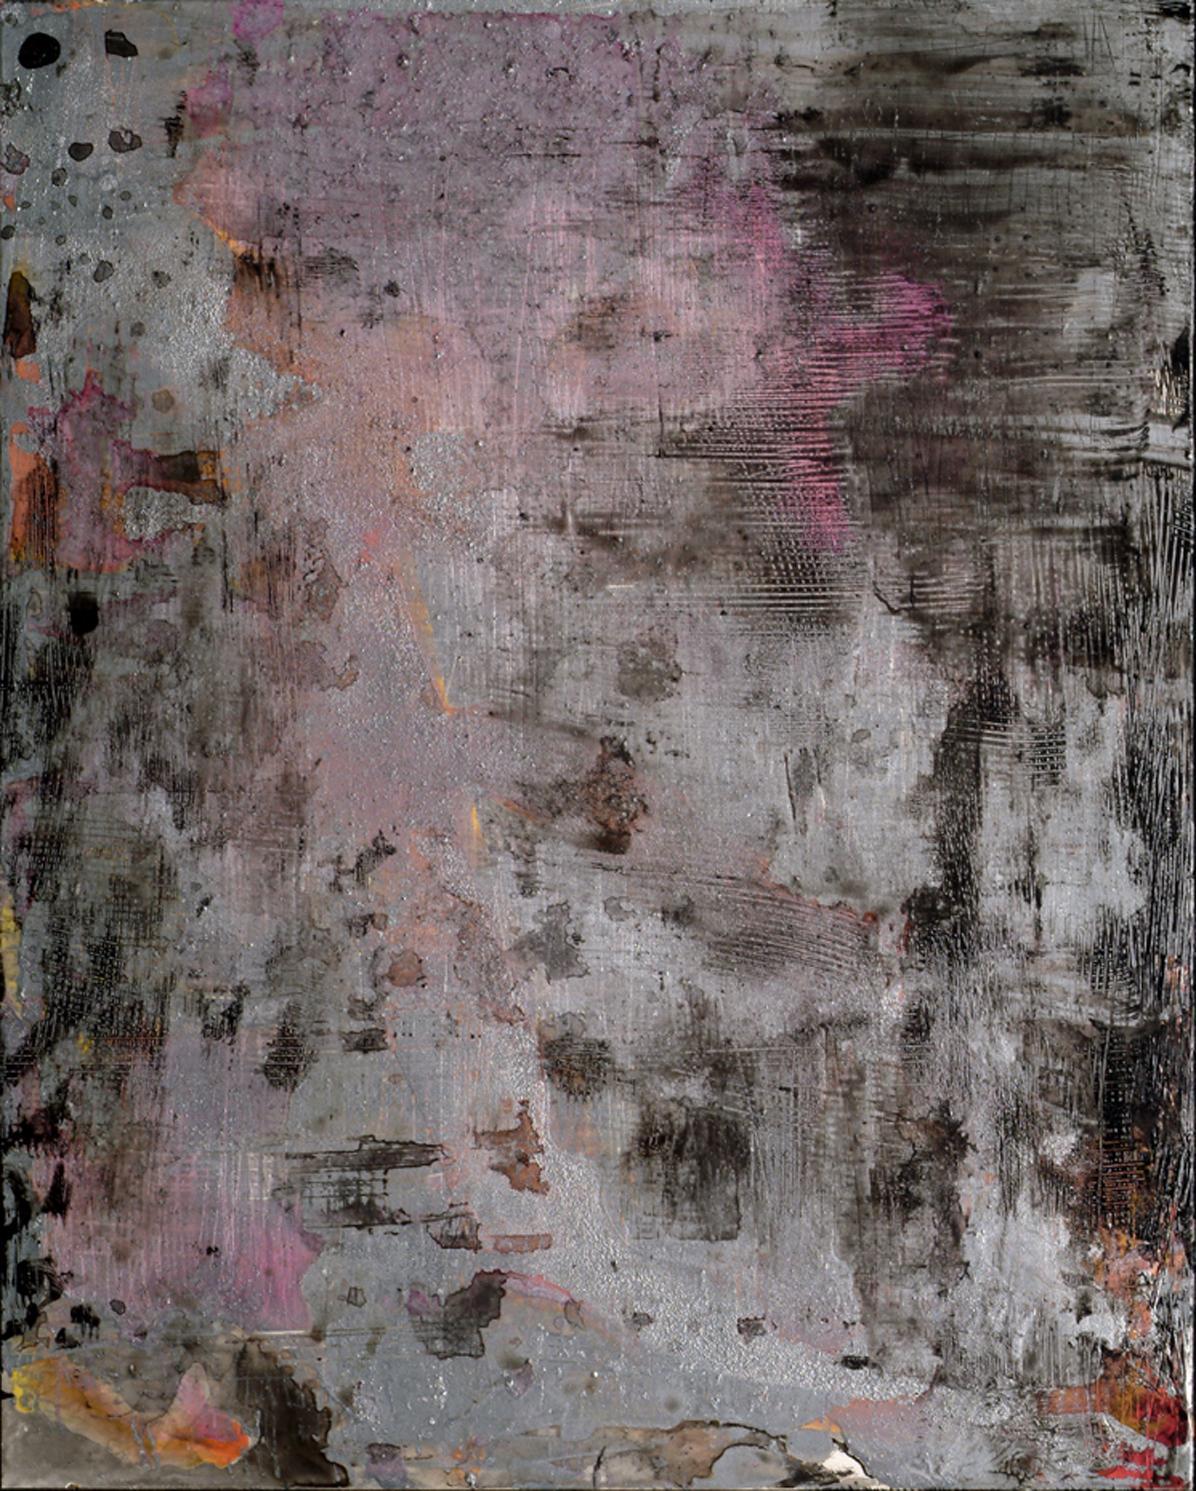 Ellen Hackl Fagan, Dusk, 2006, Enamel, Ink, Acrylic, Aluminum